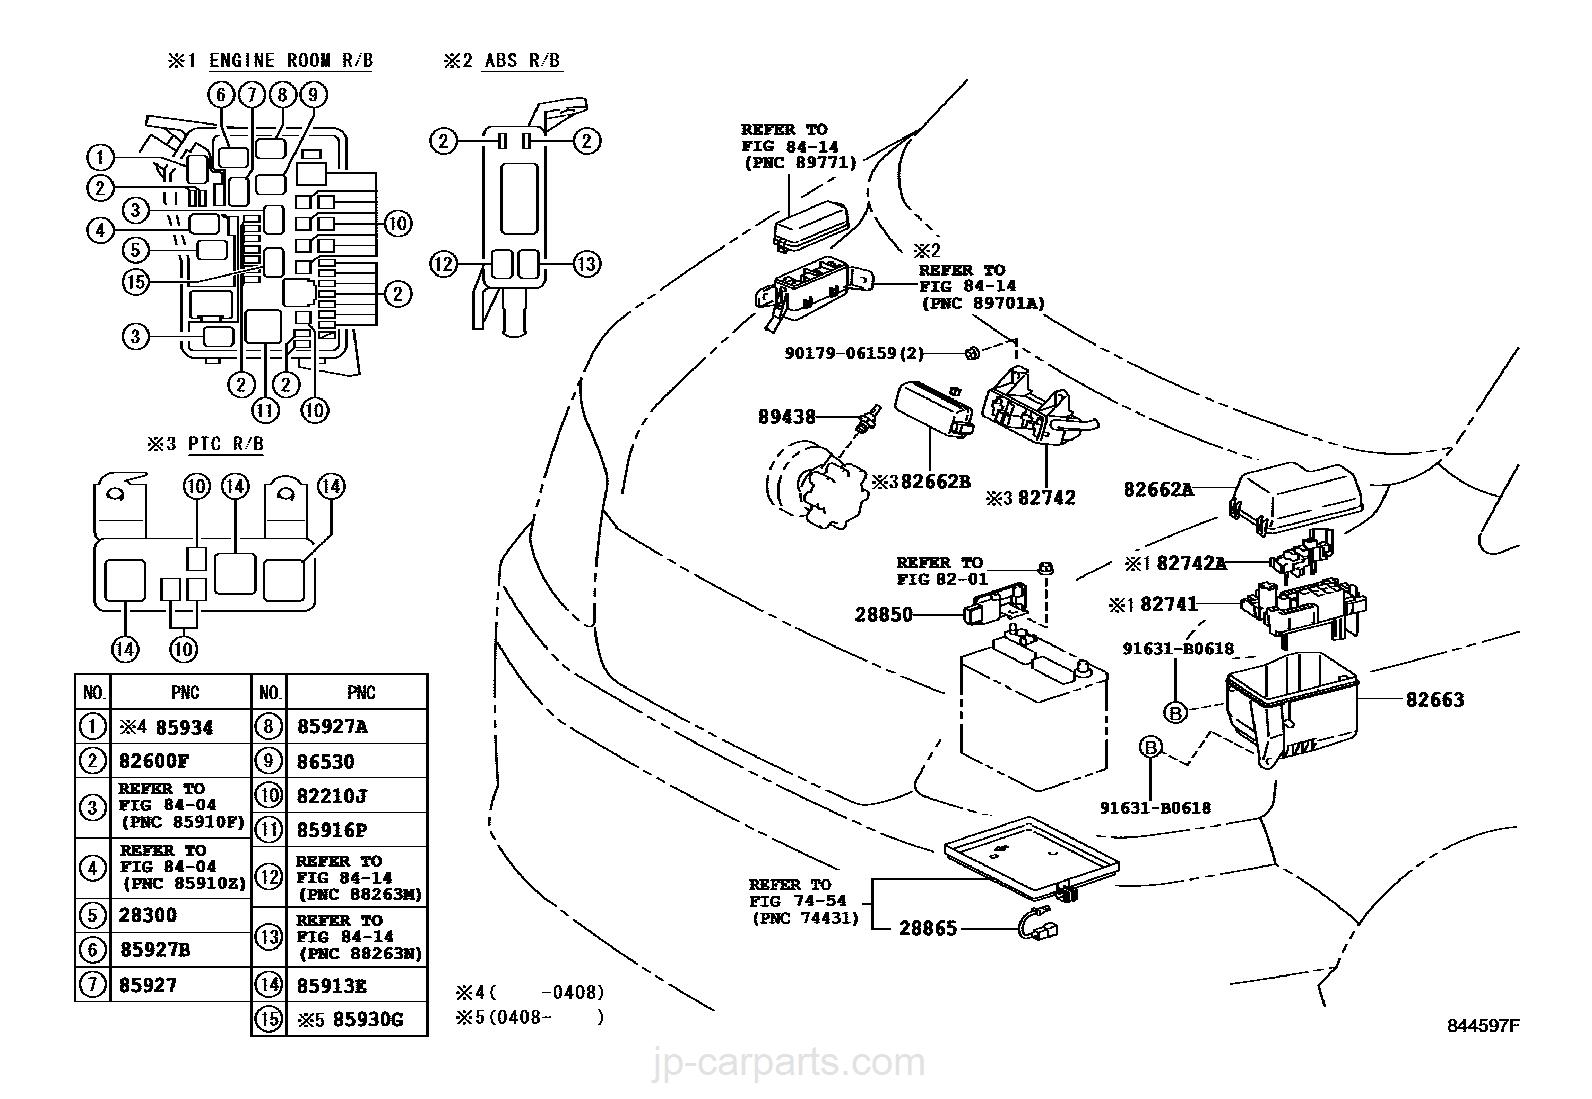 hight resolution of toyota noah fuse box wiring diagram data val toyota noah 2005 fuse box location switch